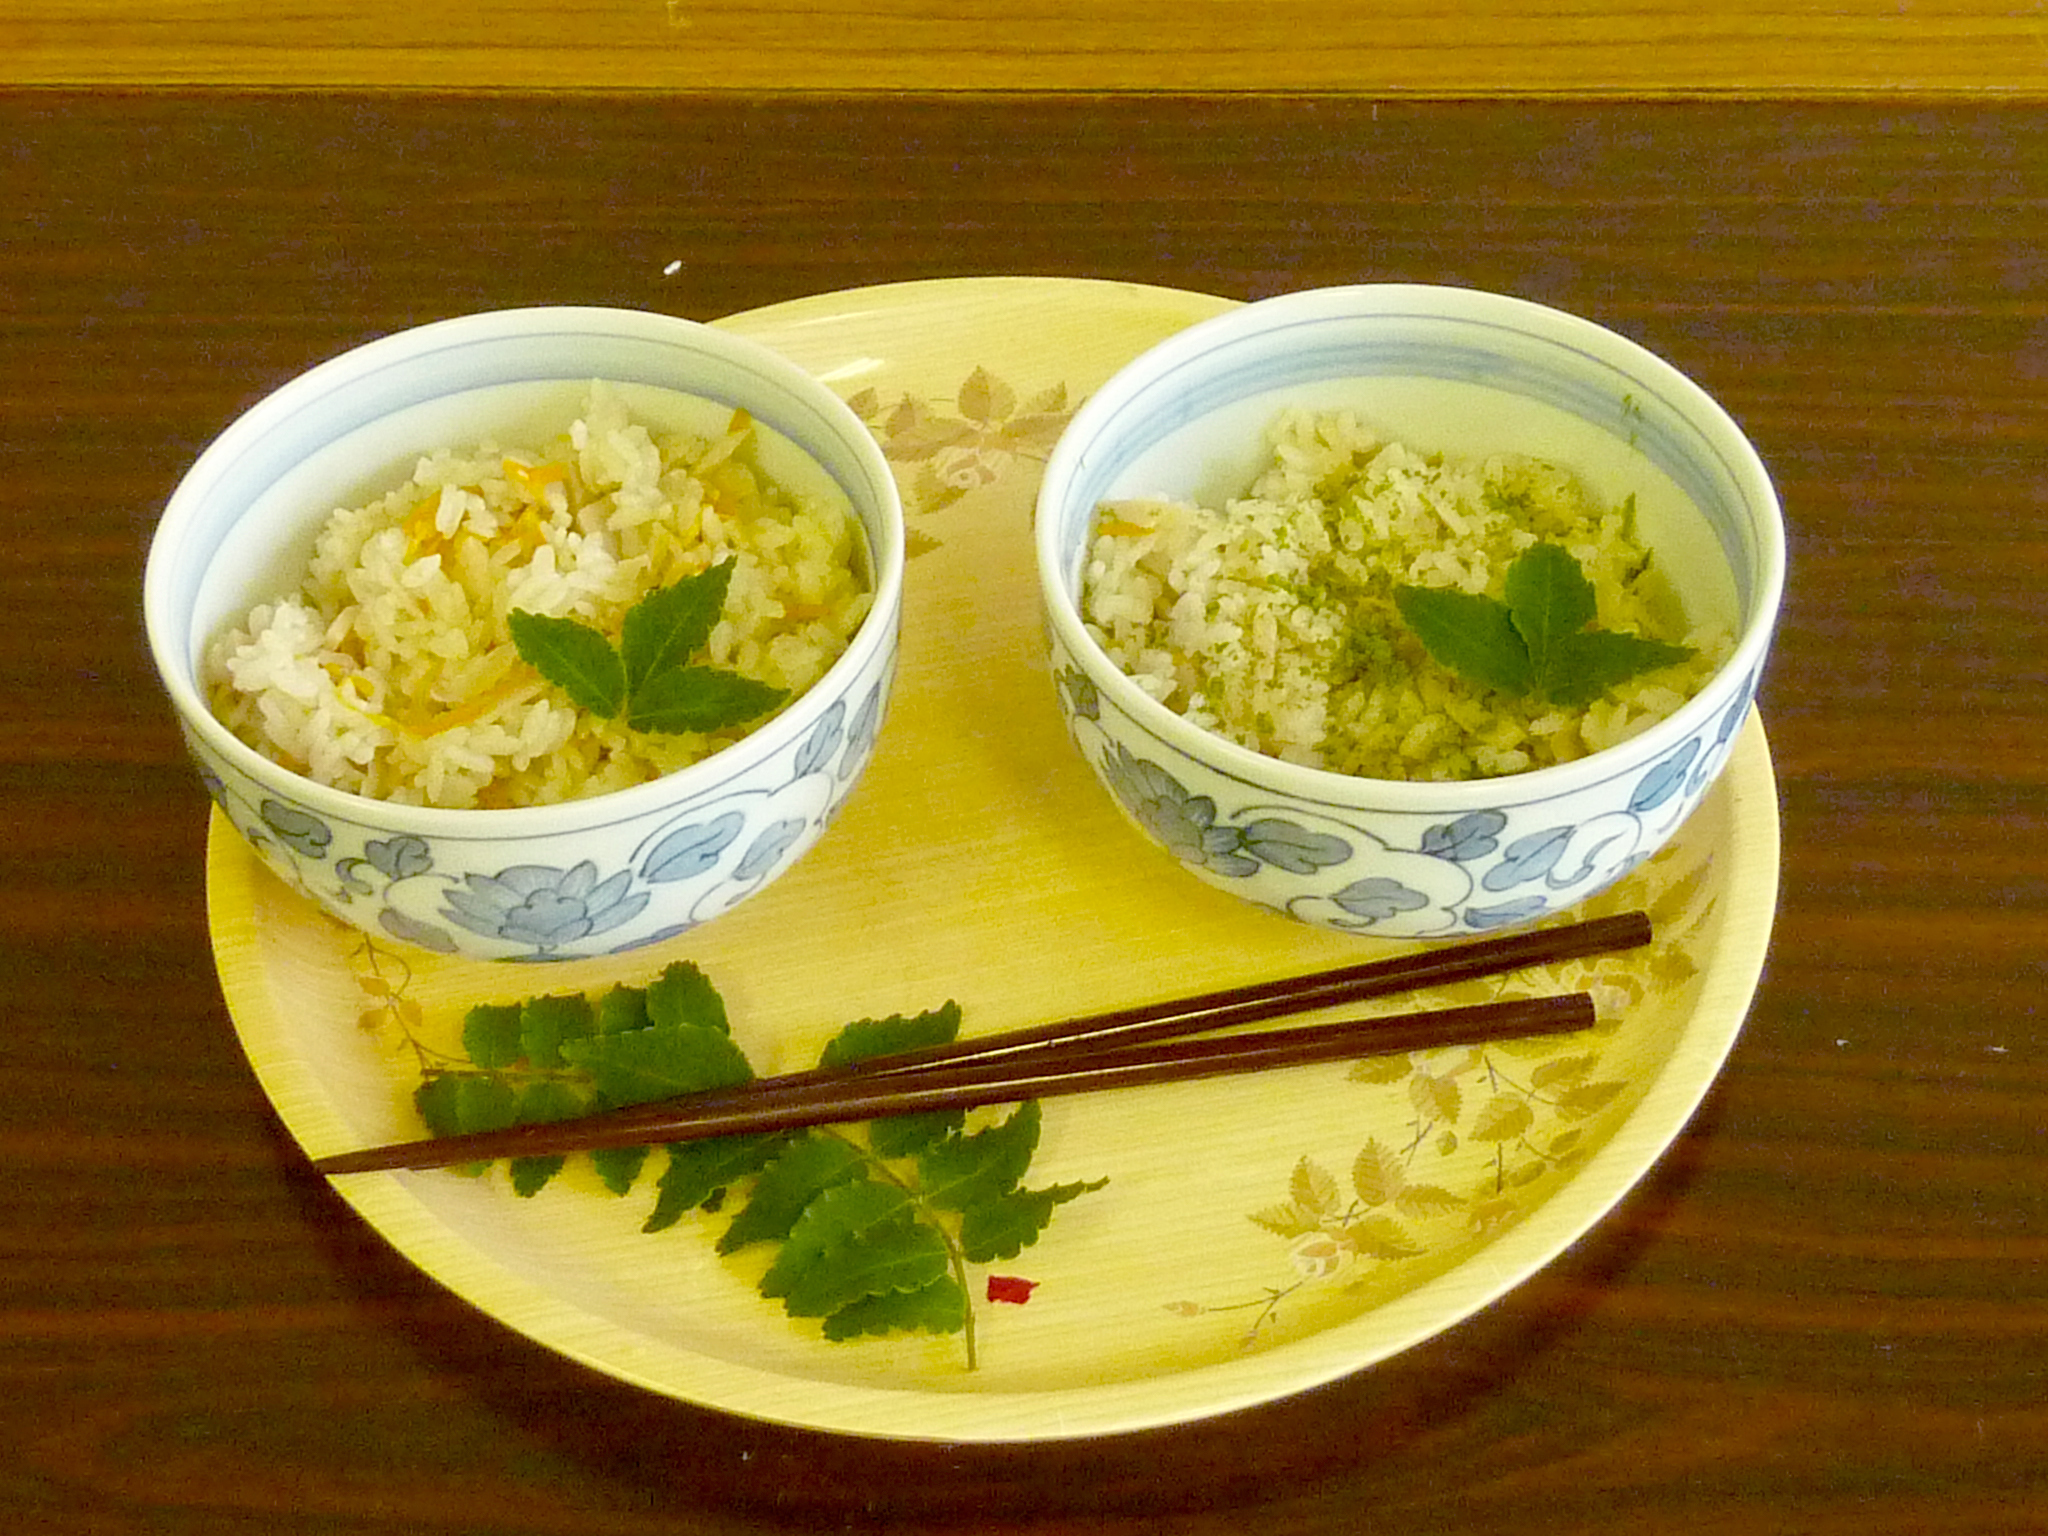 静岡県「新茶と竹の子ご飯」JA静岡市瀬名女性部